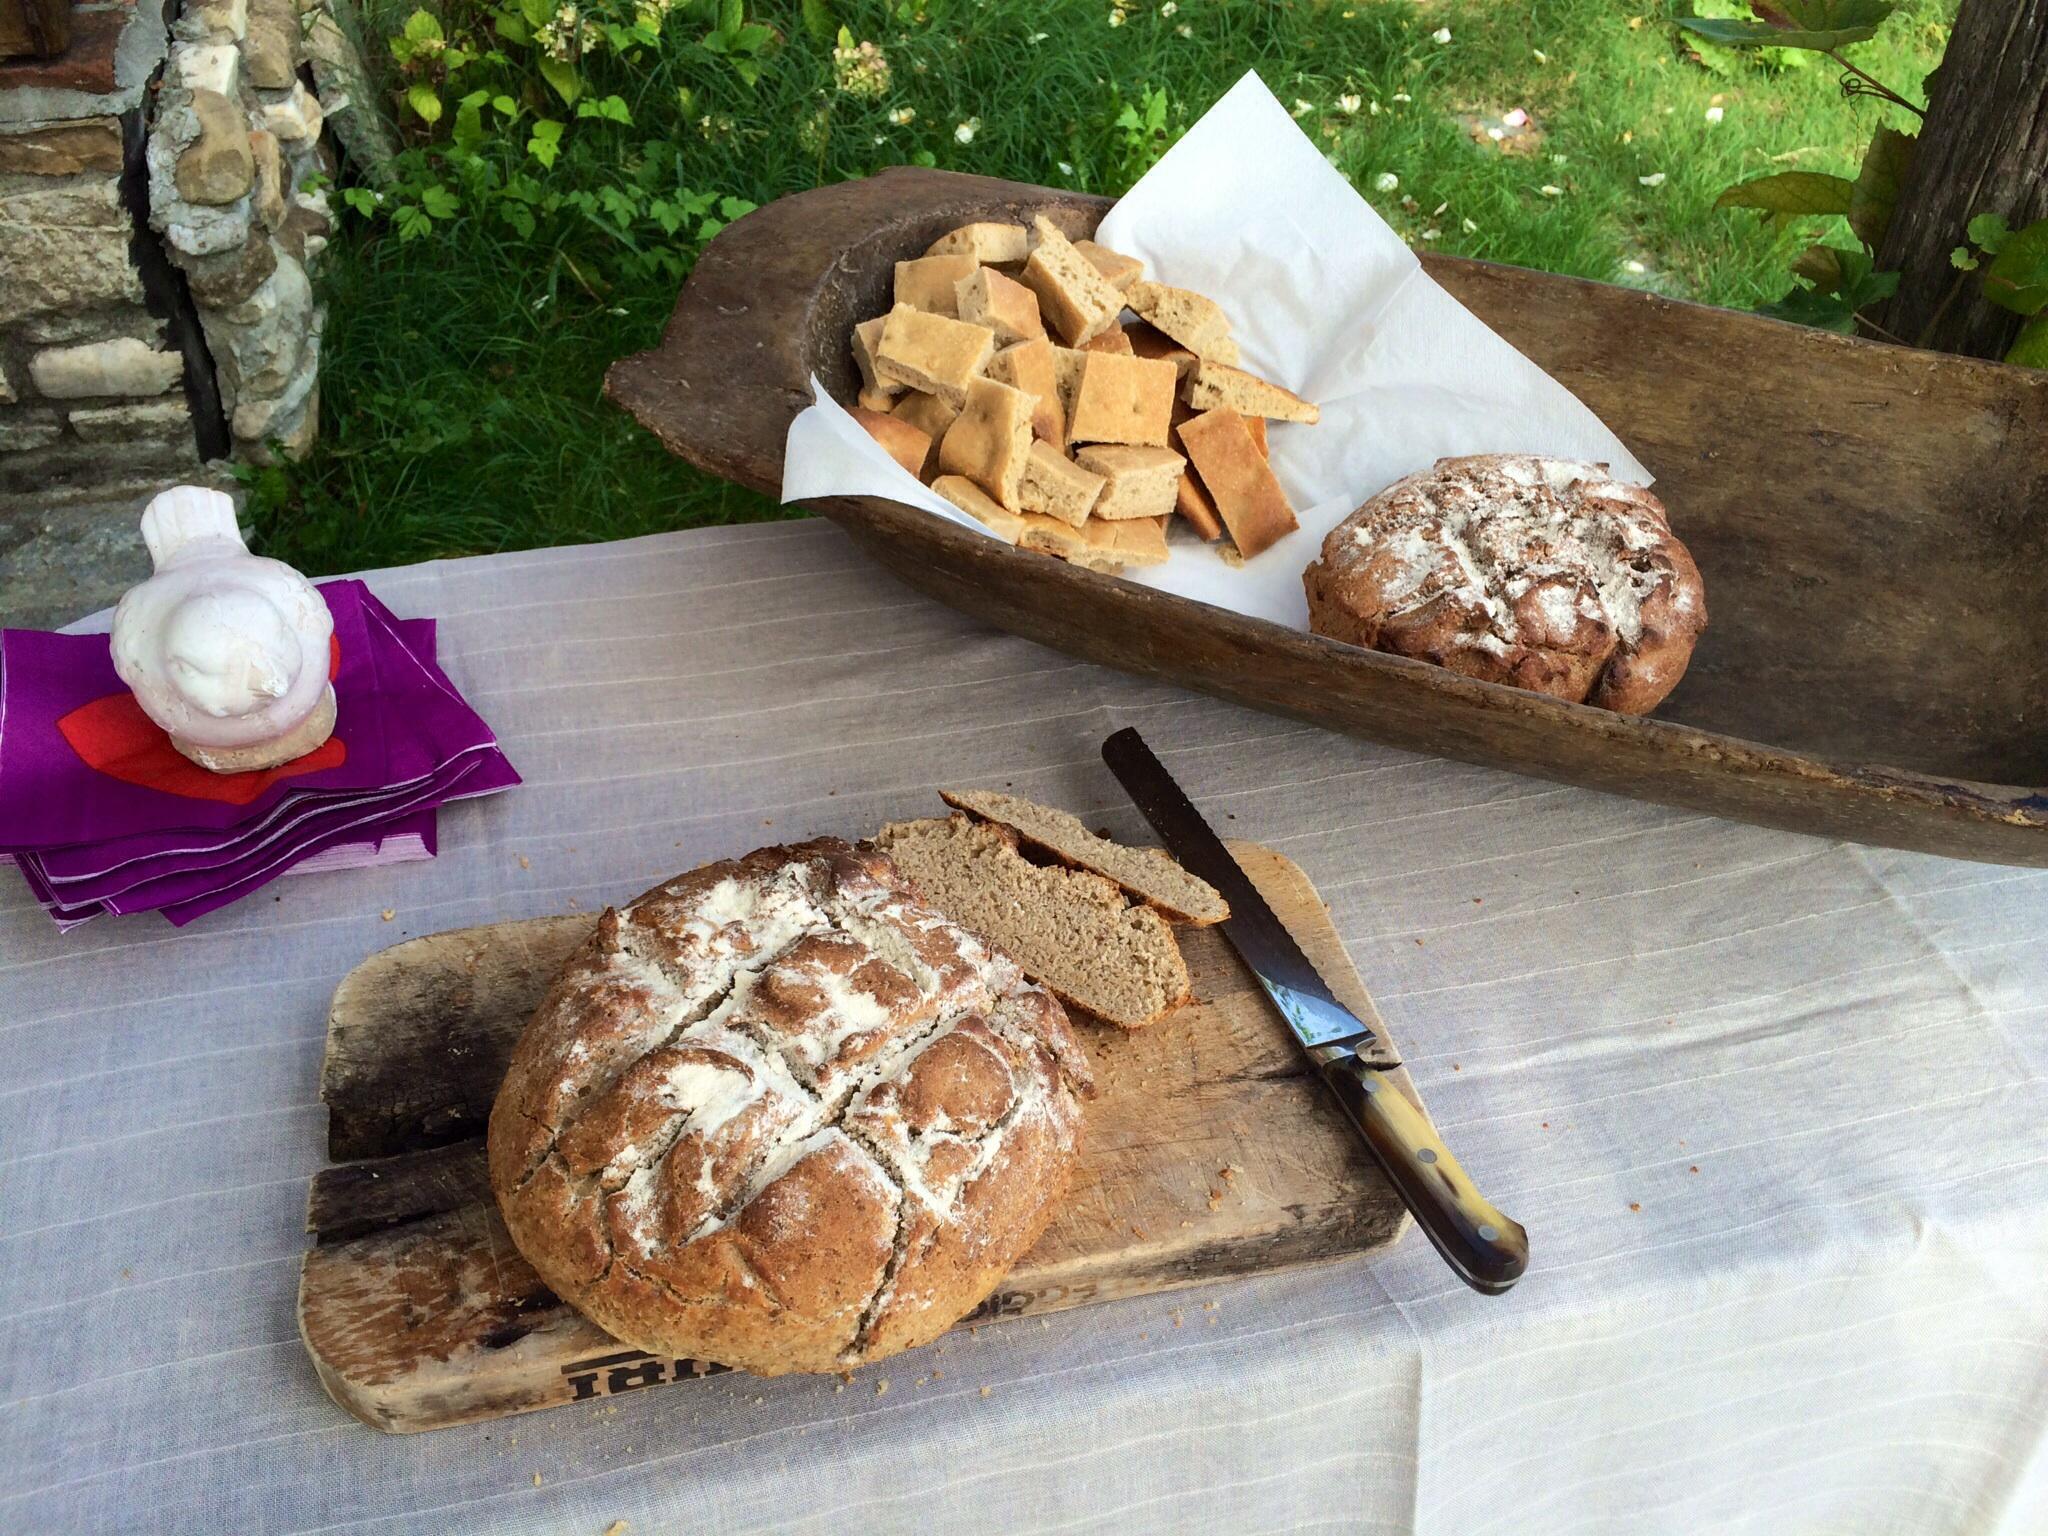 Corso cucina pane a lievitazione naturale e farine alternative - Corsi cucina piacenza ...